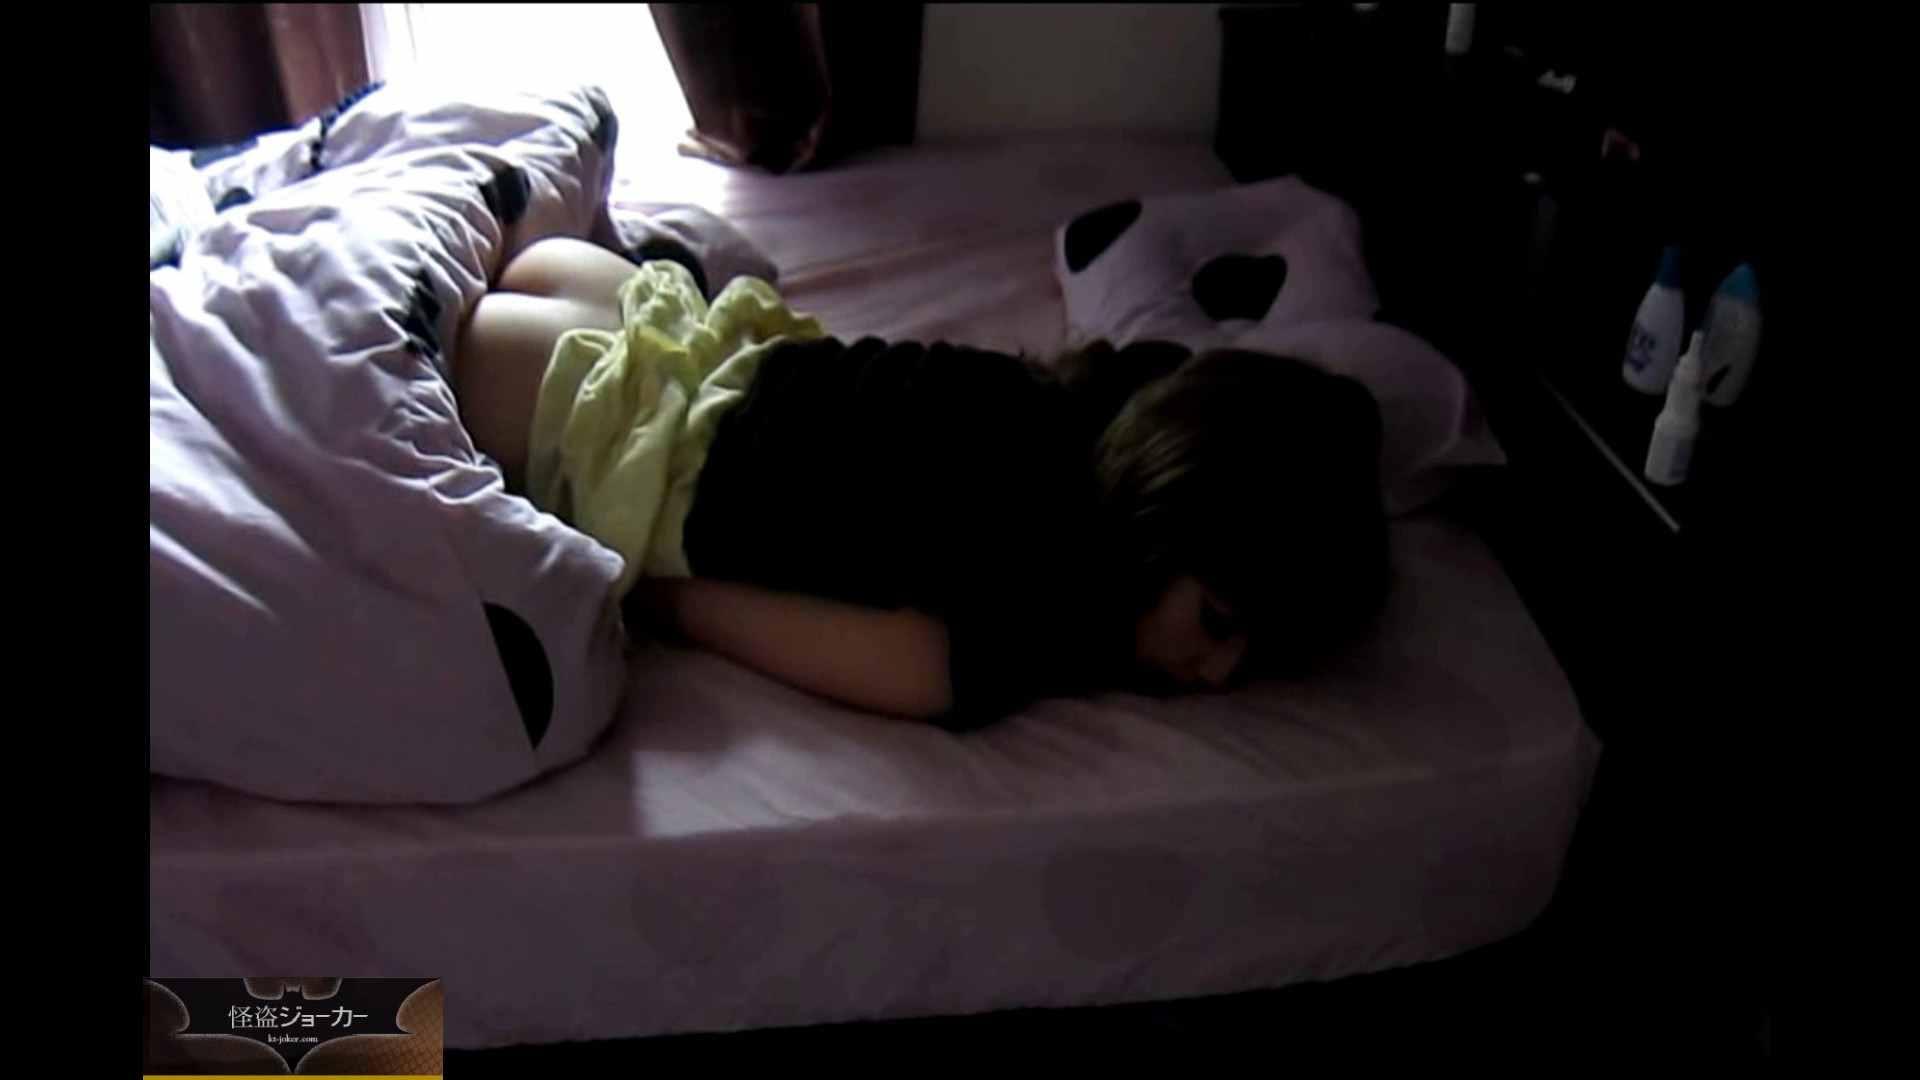 vol.6 ユリナの実女市・・・自慰に響く淫靡な音・・・ ローター AV無料動画キャプチャ 104枚 11